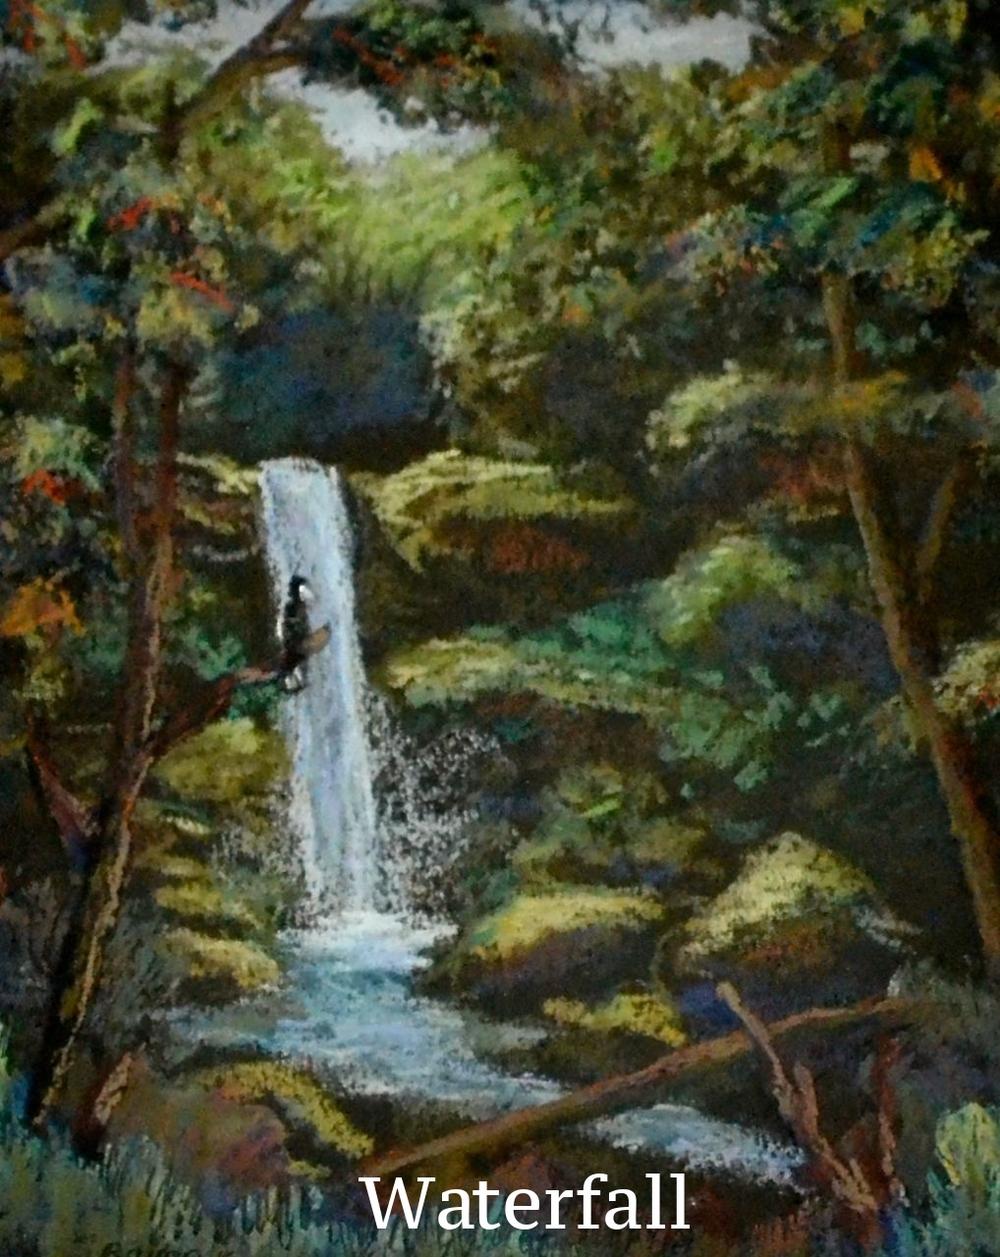 DSC_0105 -waterfall:bird.jpg